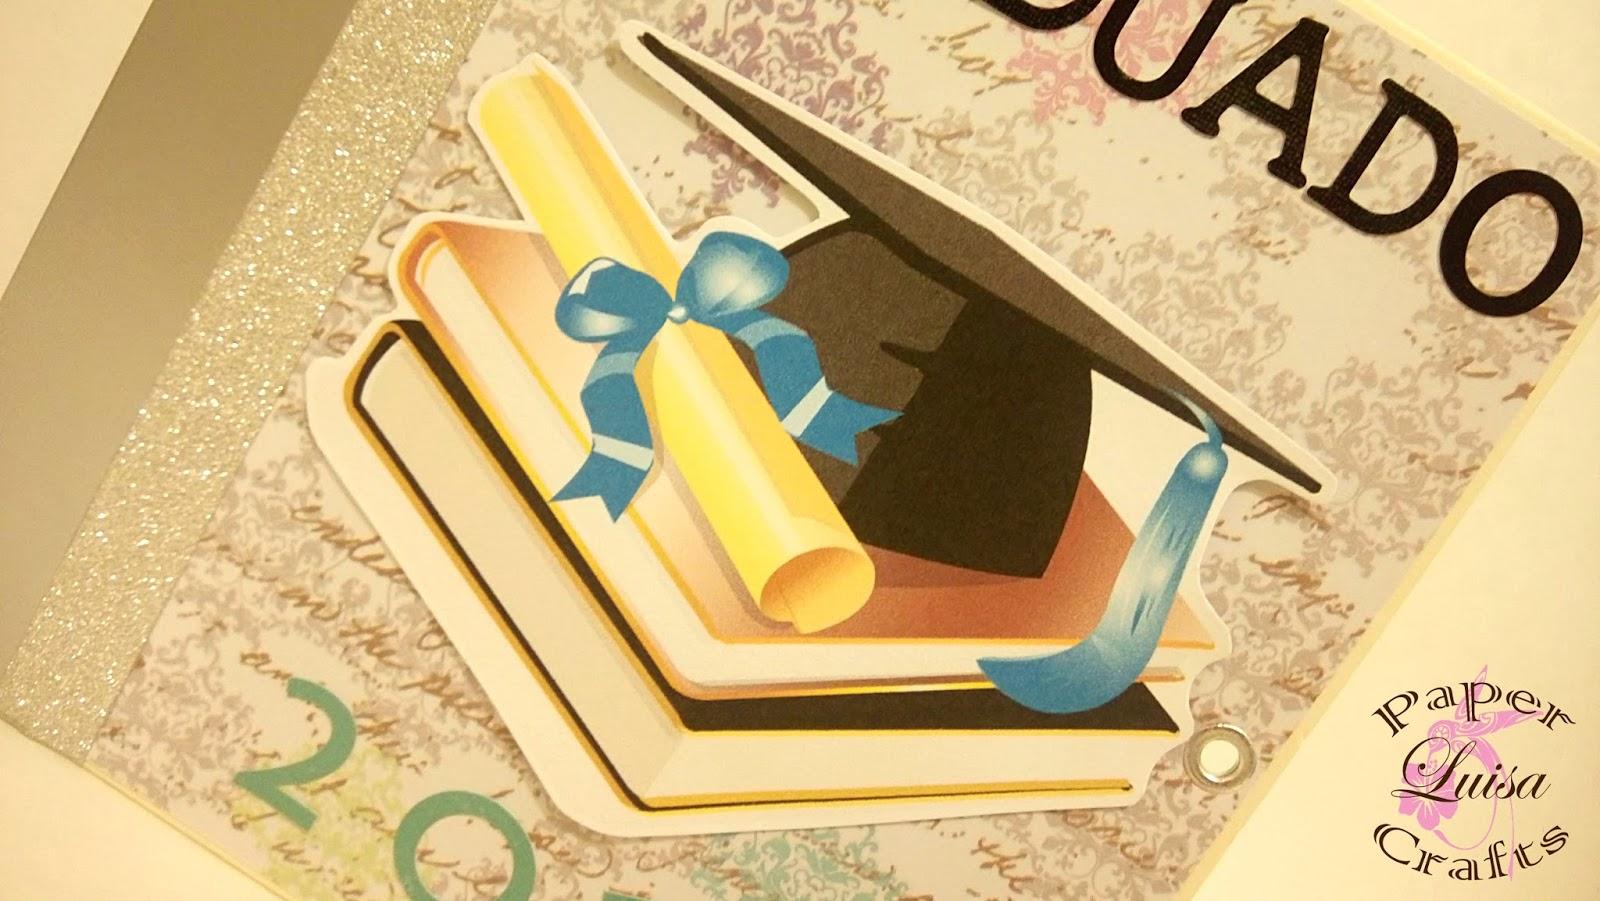 Luisa papercrafts mini album graduaci n - Cosas para decorar las fotos ...